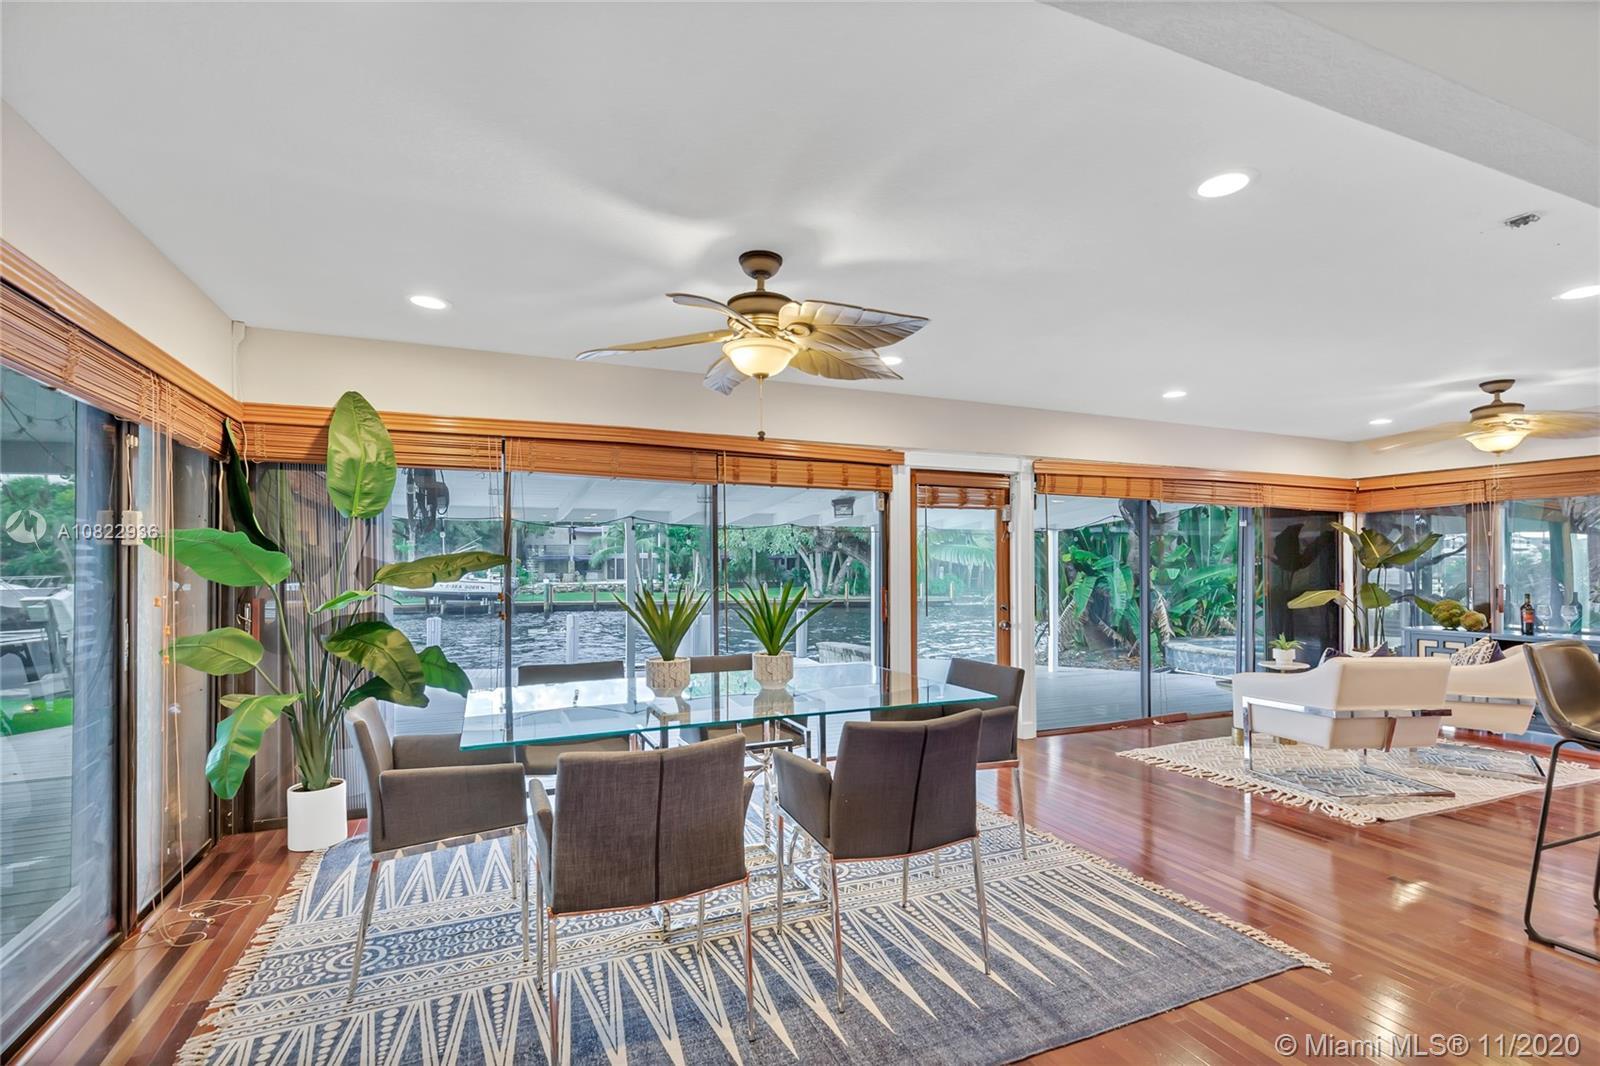 1332 Guava Isle, Fort Lauderdale, FL 33315